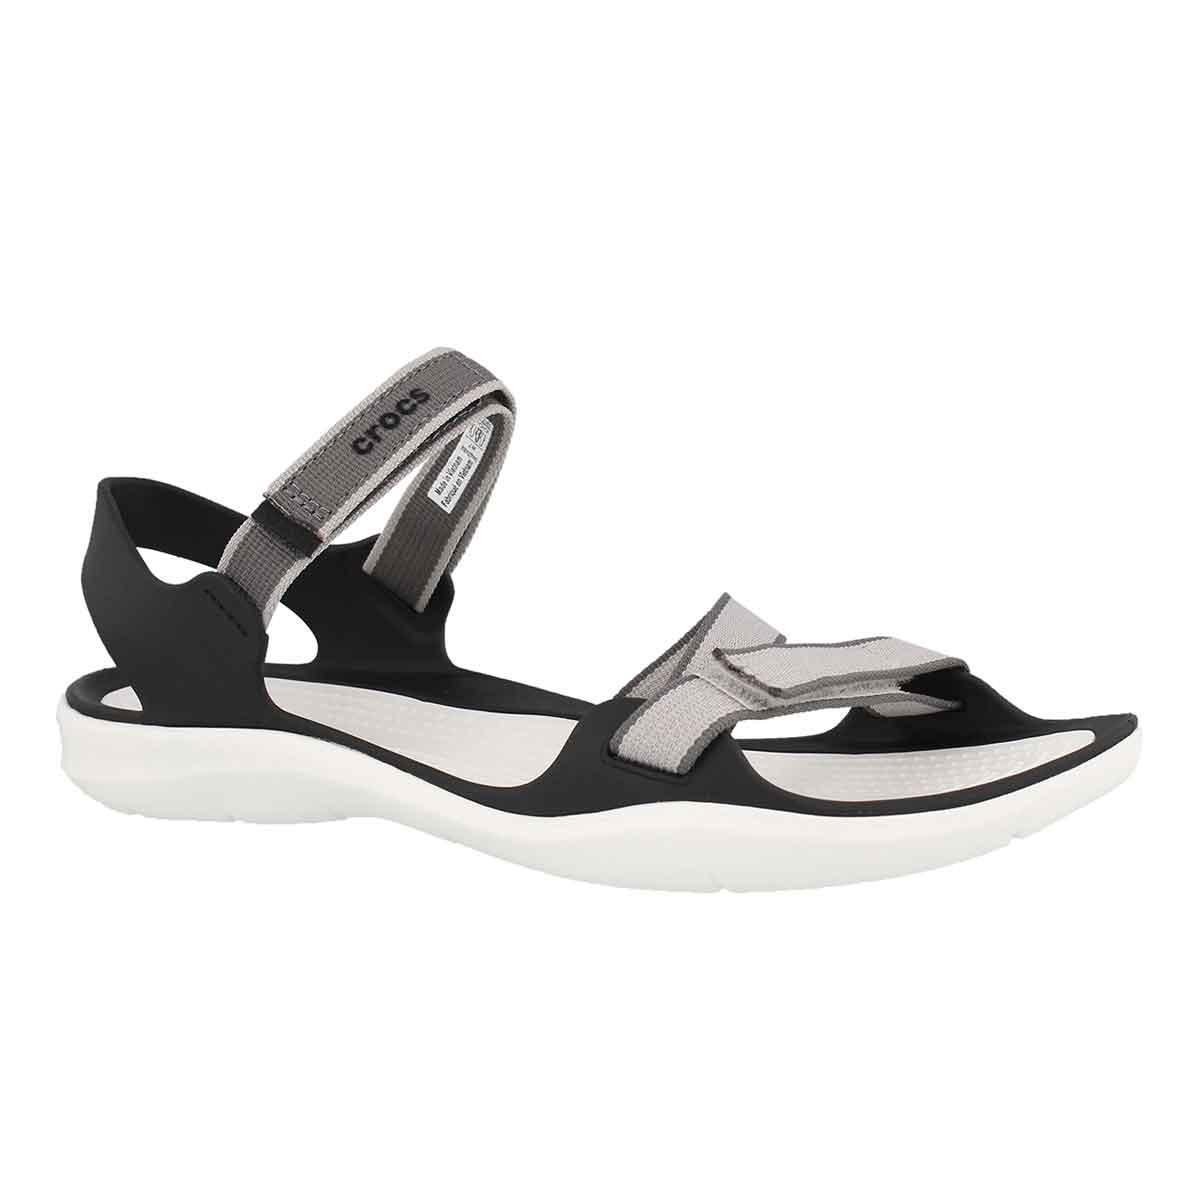 Women's SWIFTWATER WEBBING pearl white sandals